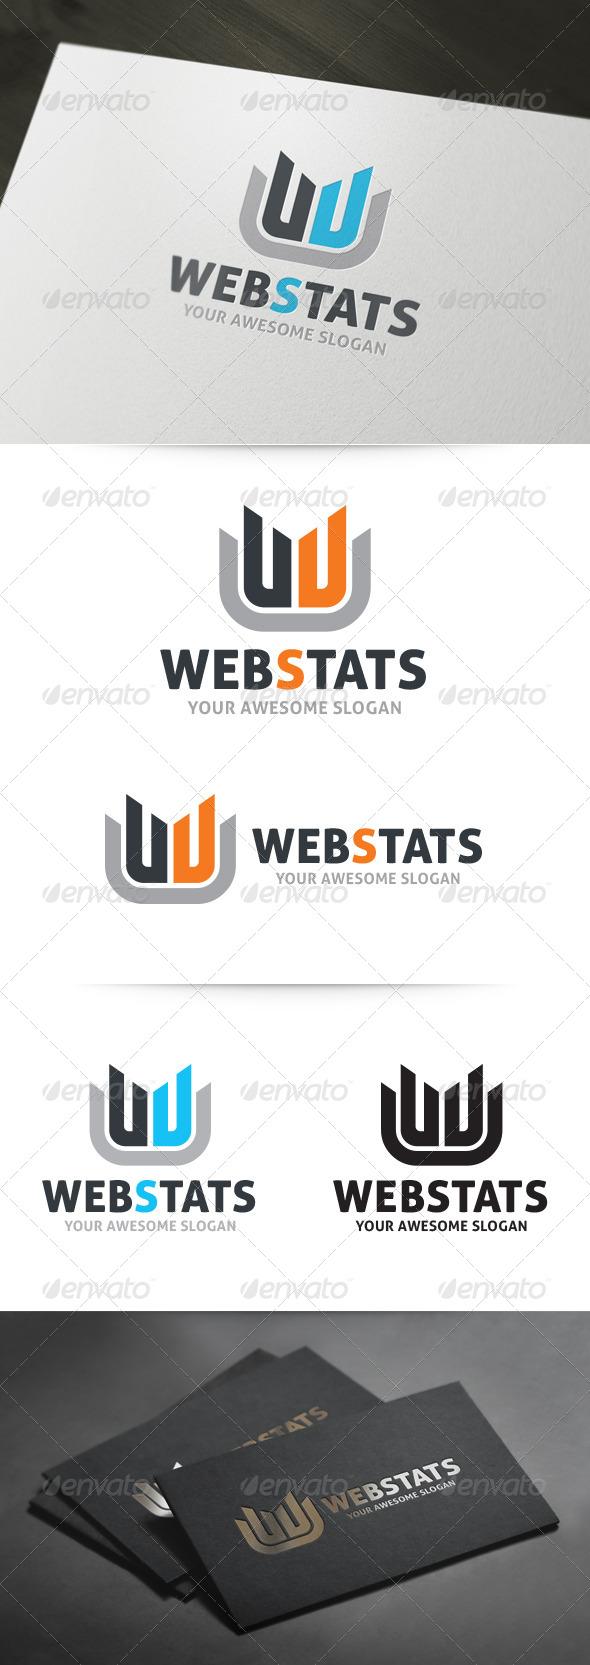 Web Stats - Letter W Logo